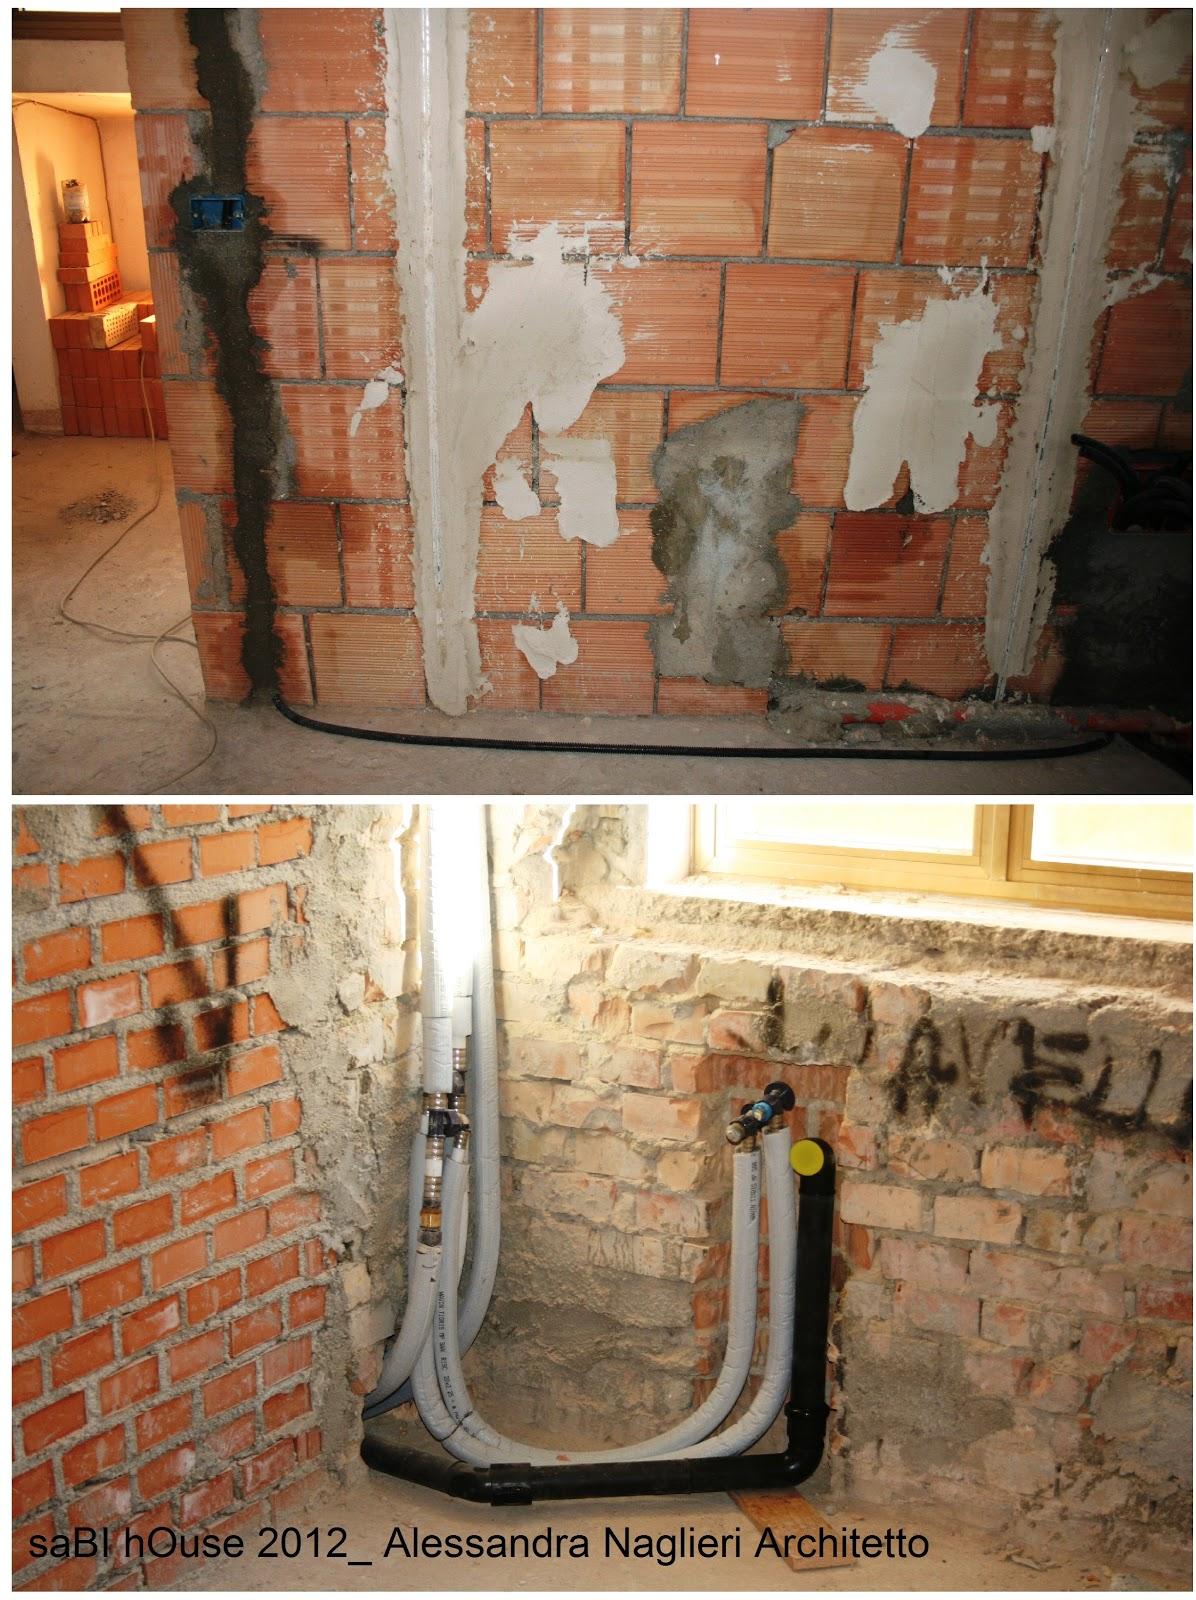 Sabi house impianto di riscaldamento radiante a pavimento - Scarico cucina e bagno insieme ...